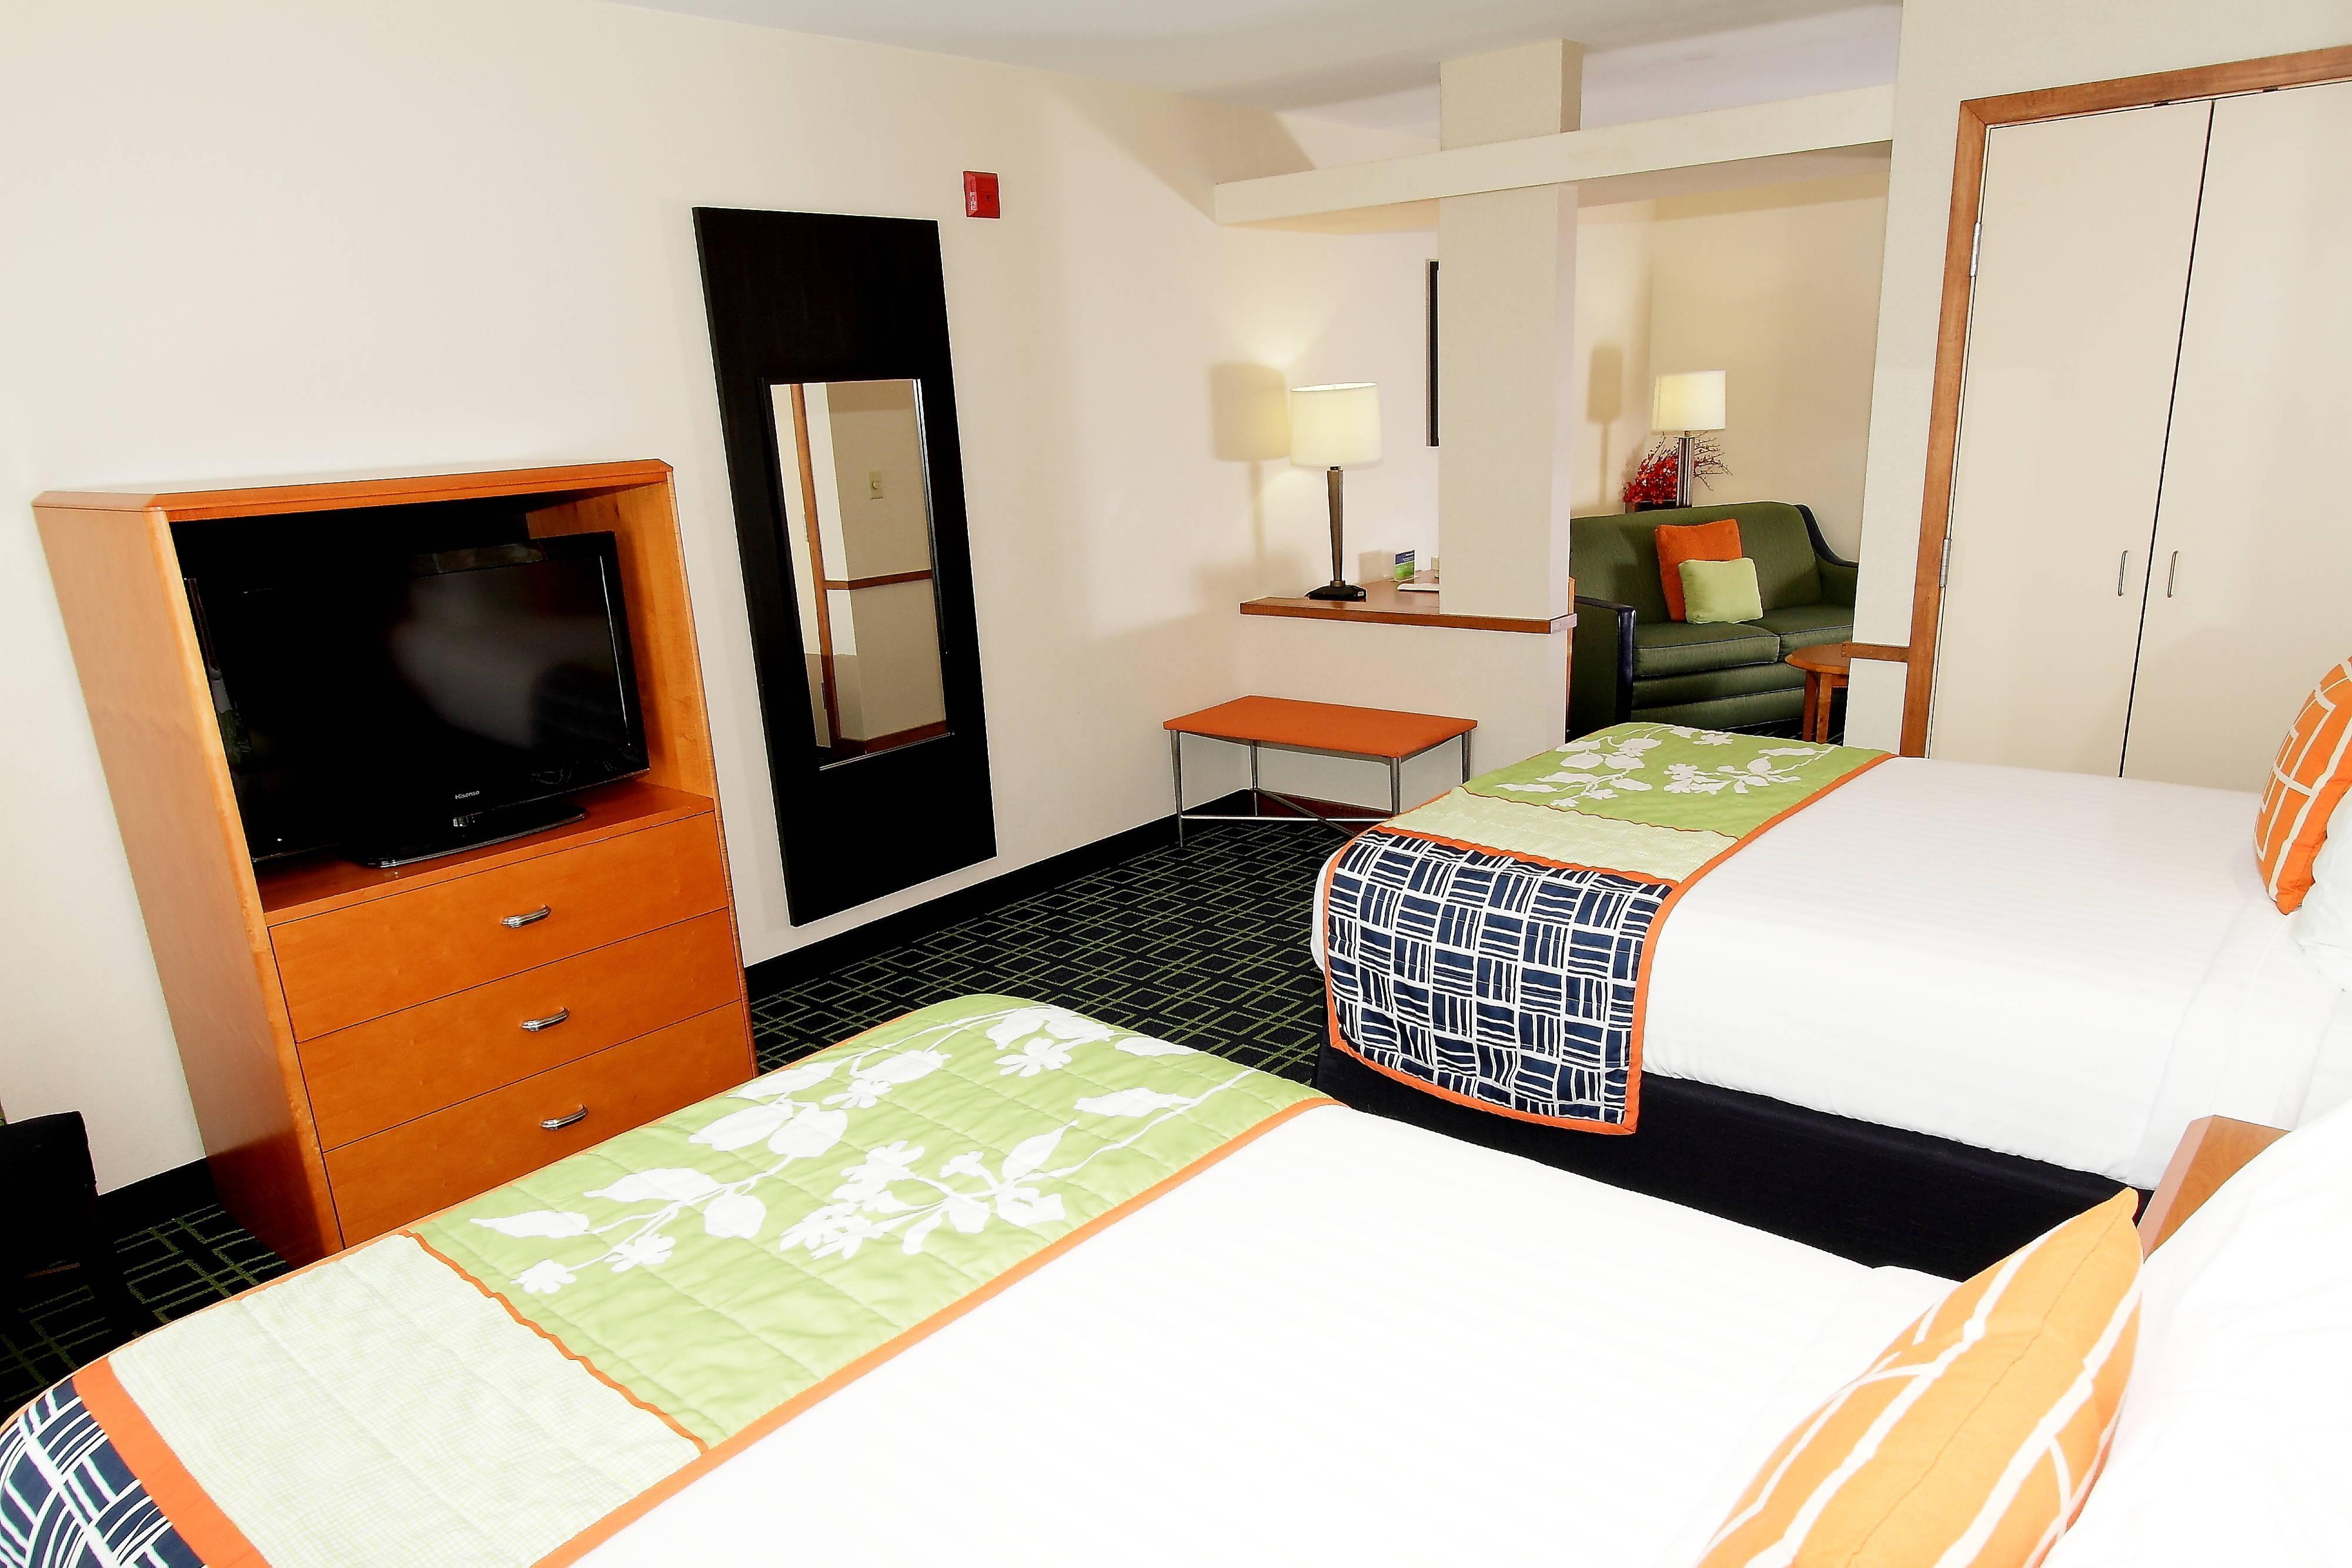 Executive Suite mit zwei Doppelbetten